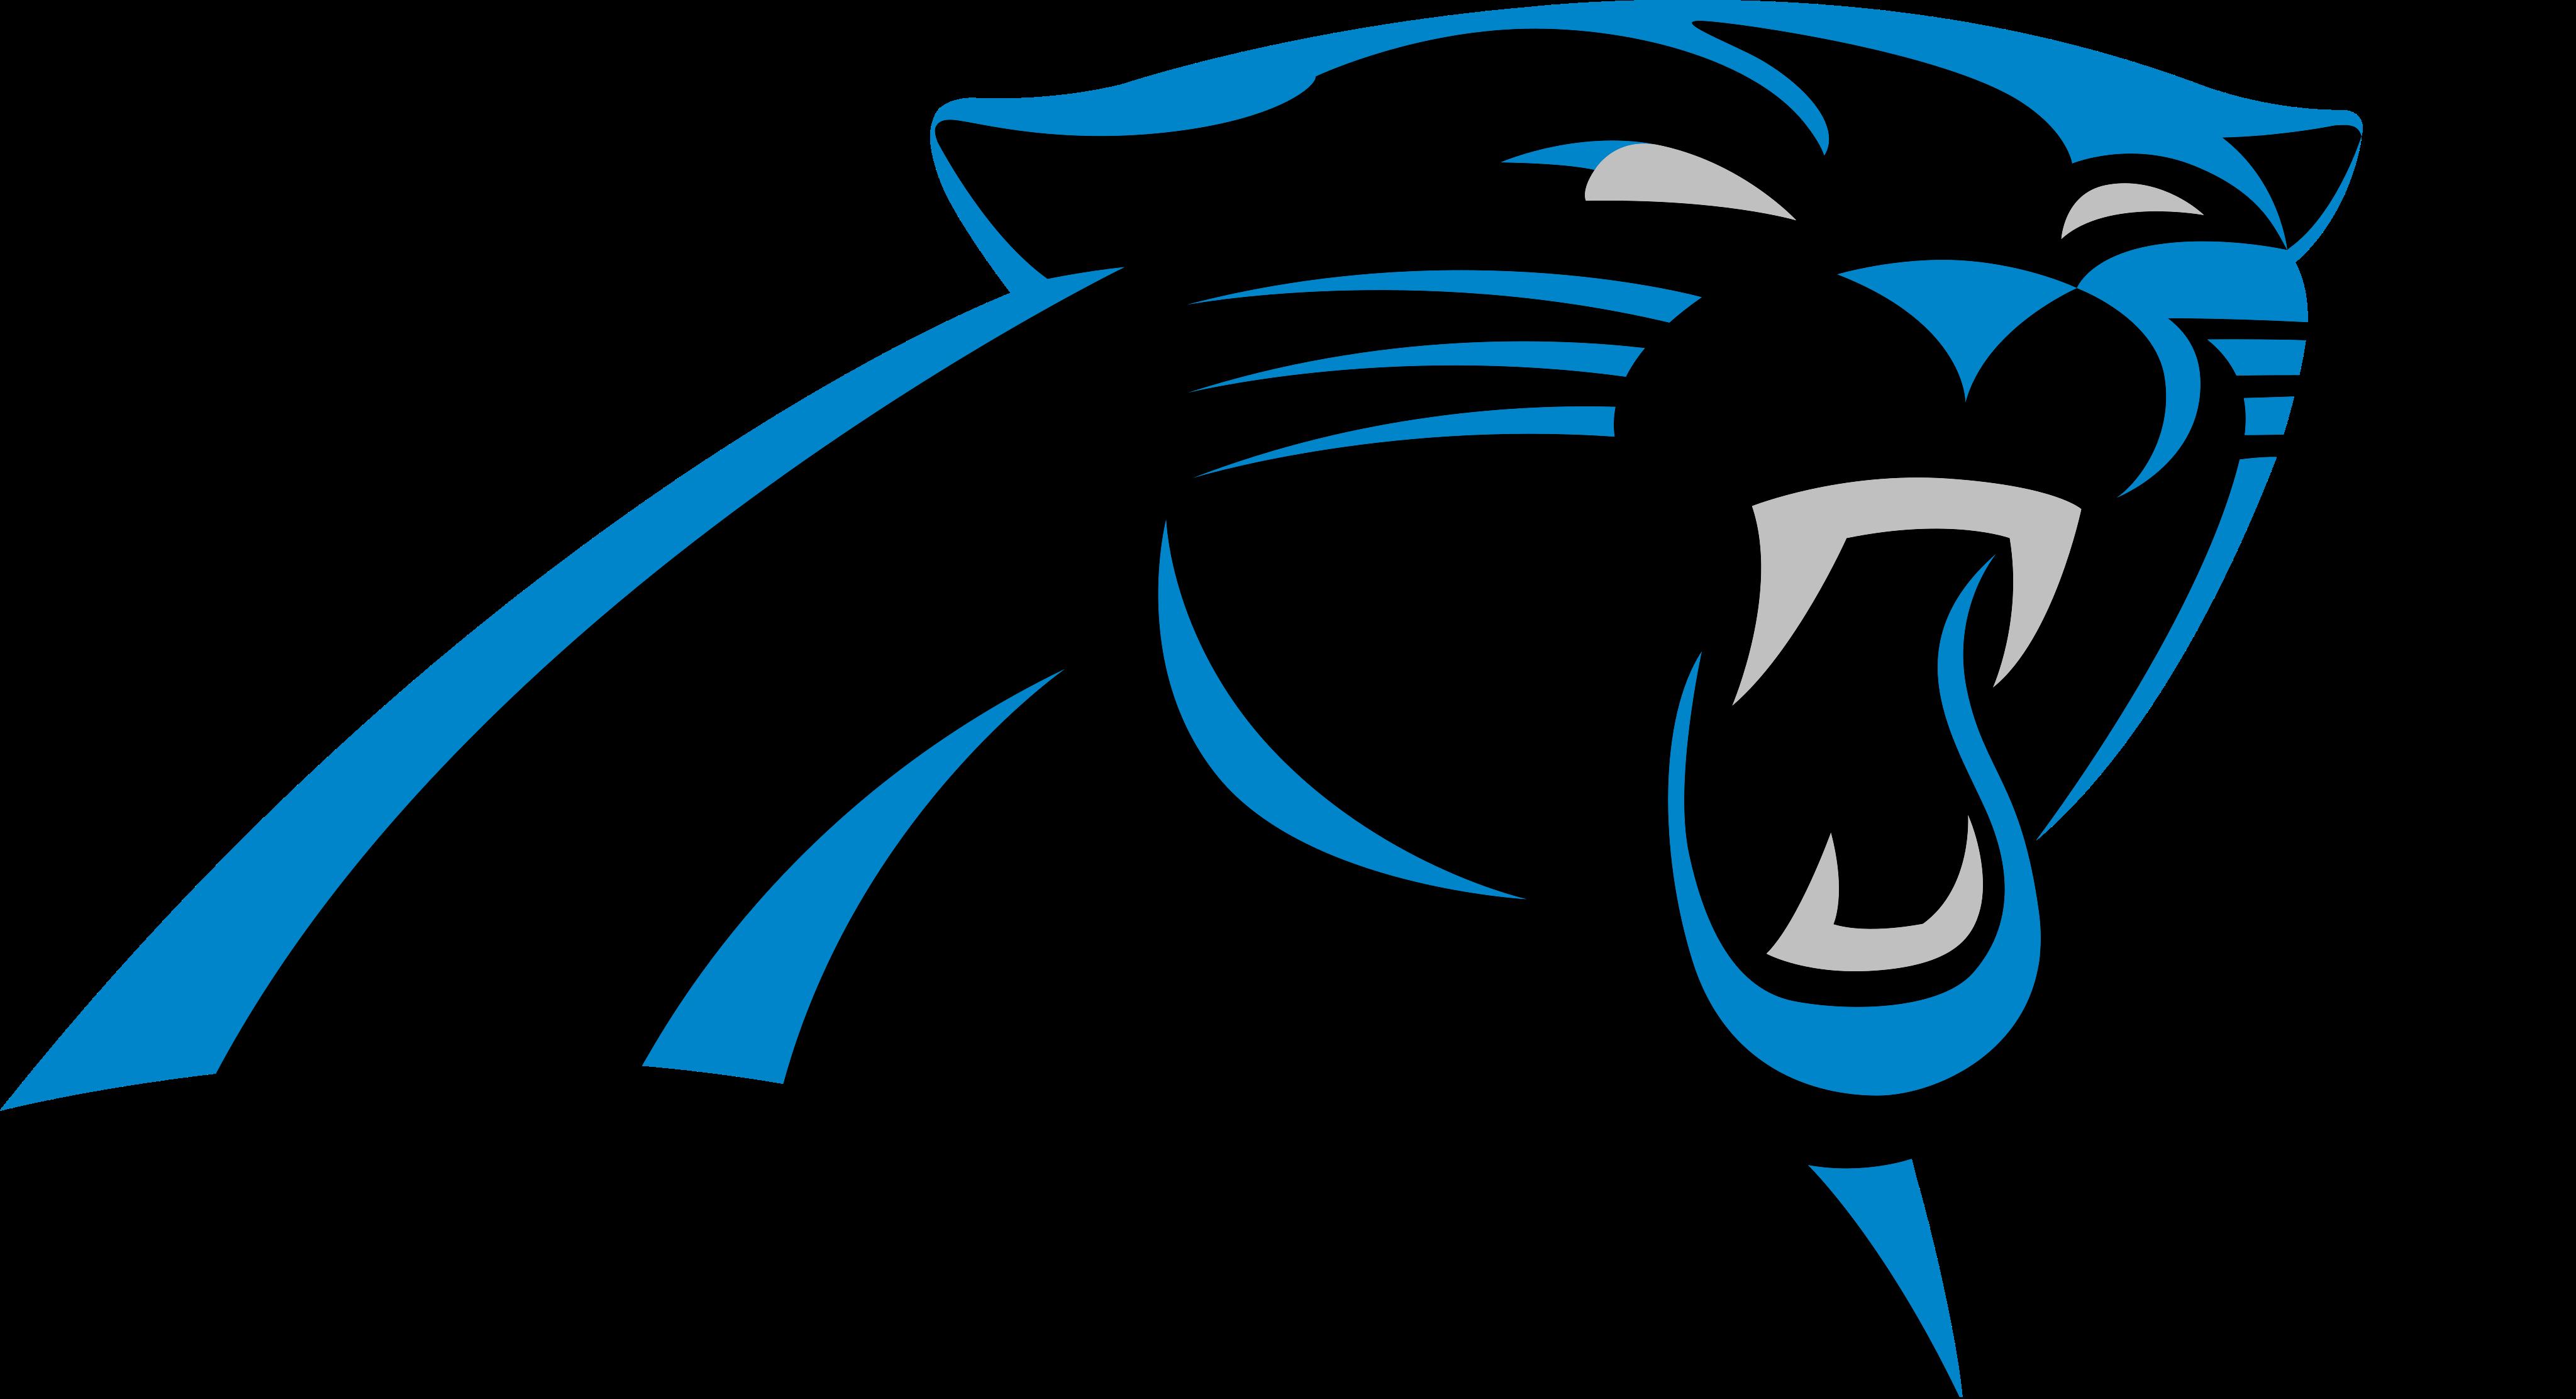 carolina panthers logo 6 - Carolina Panthers Logo